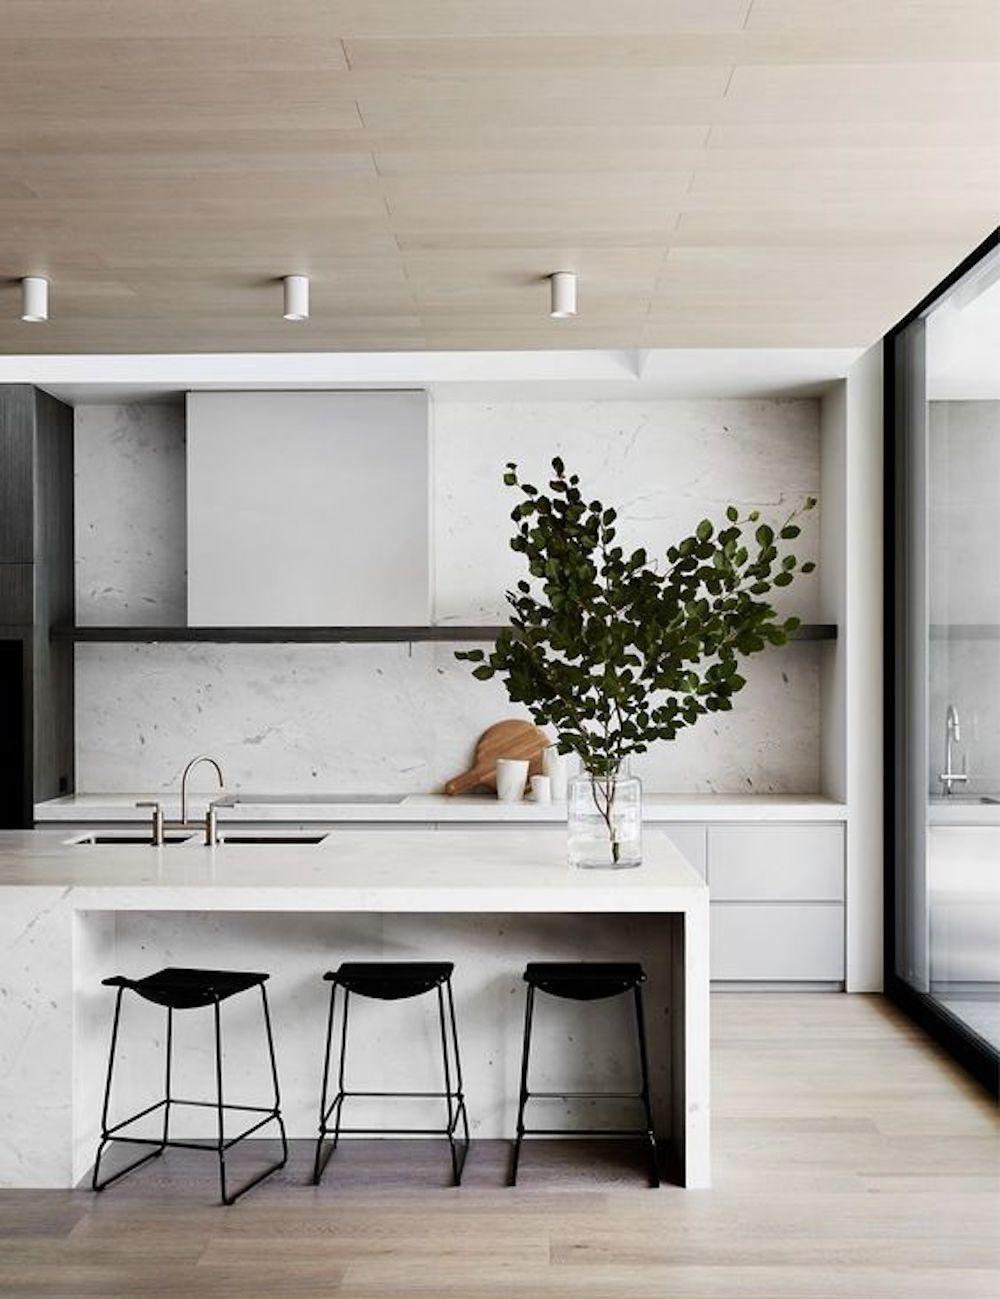 The Kitch Kitchen Remodel Pt 1 The Design In 2020 Scandinavian Kitchen Design Minimalist Kitchen Design White Modern Kitchen